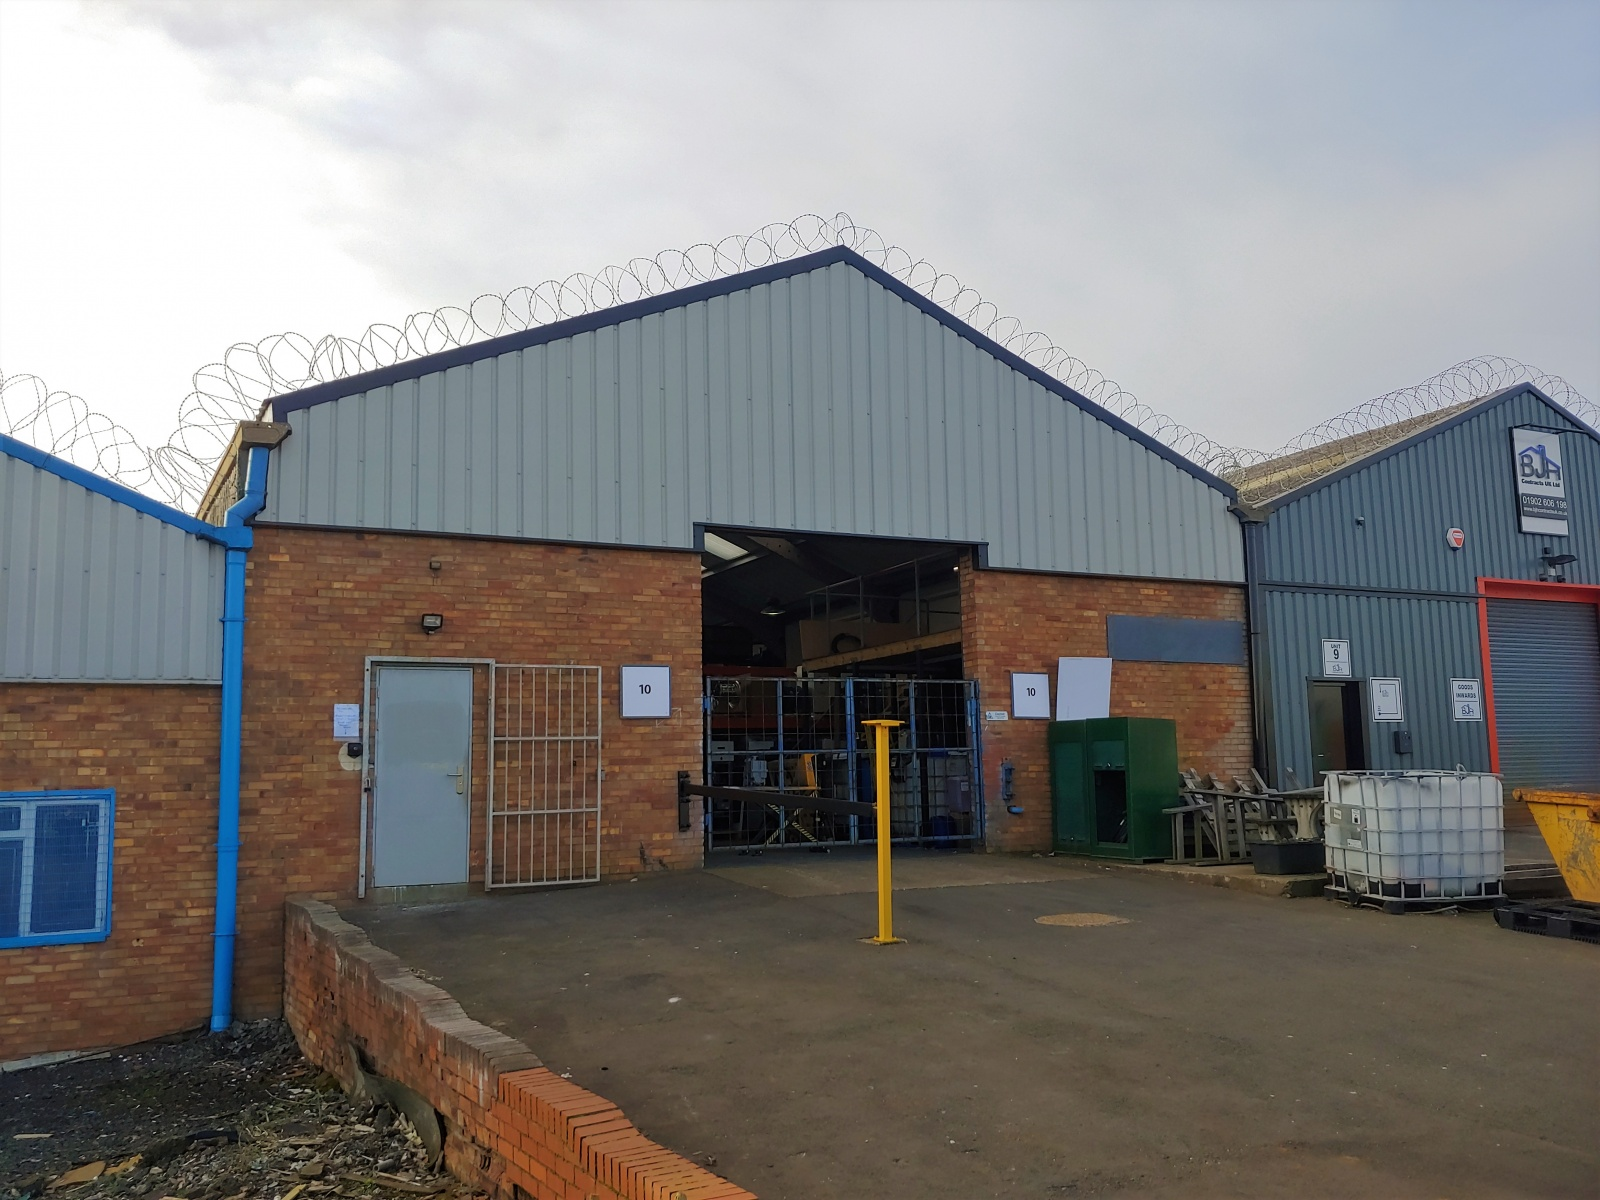 Unit 10 Strawberry Lane Industrial Estate, Strawberry Lane, Willenhall, West Midlands